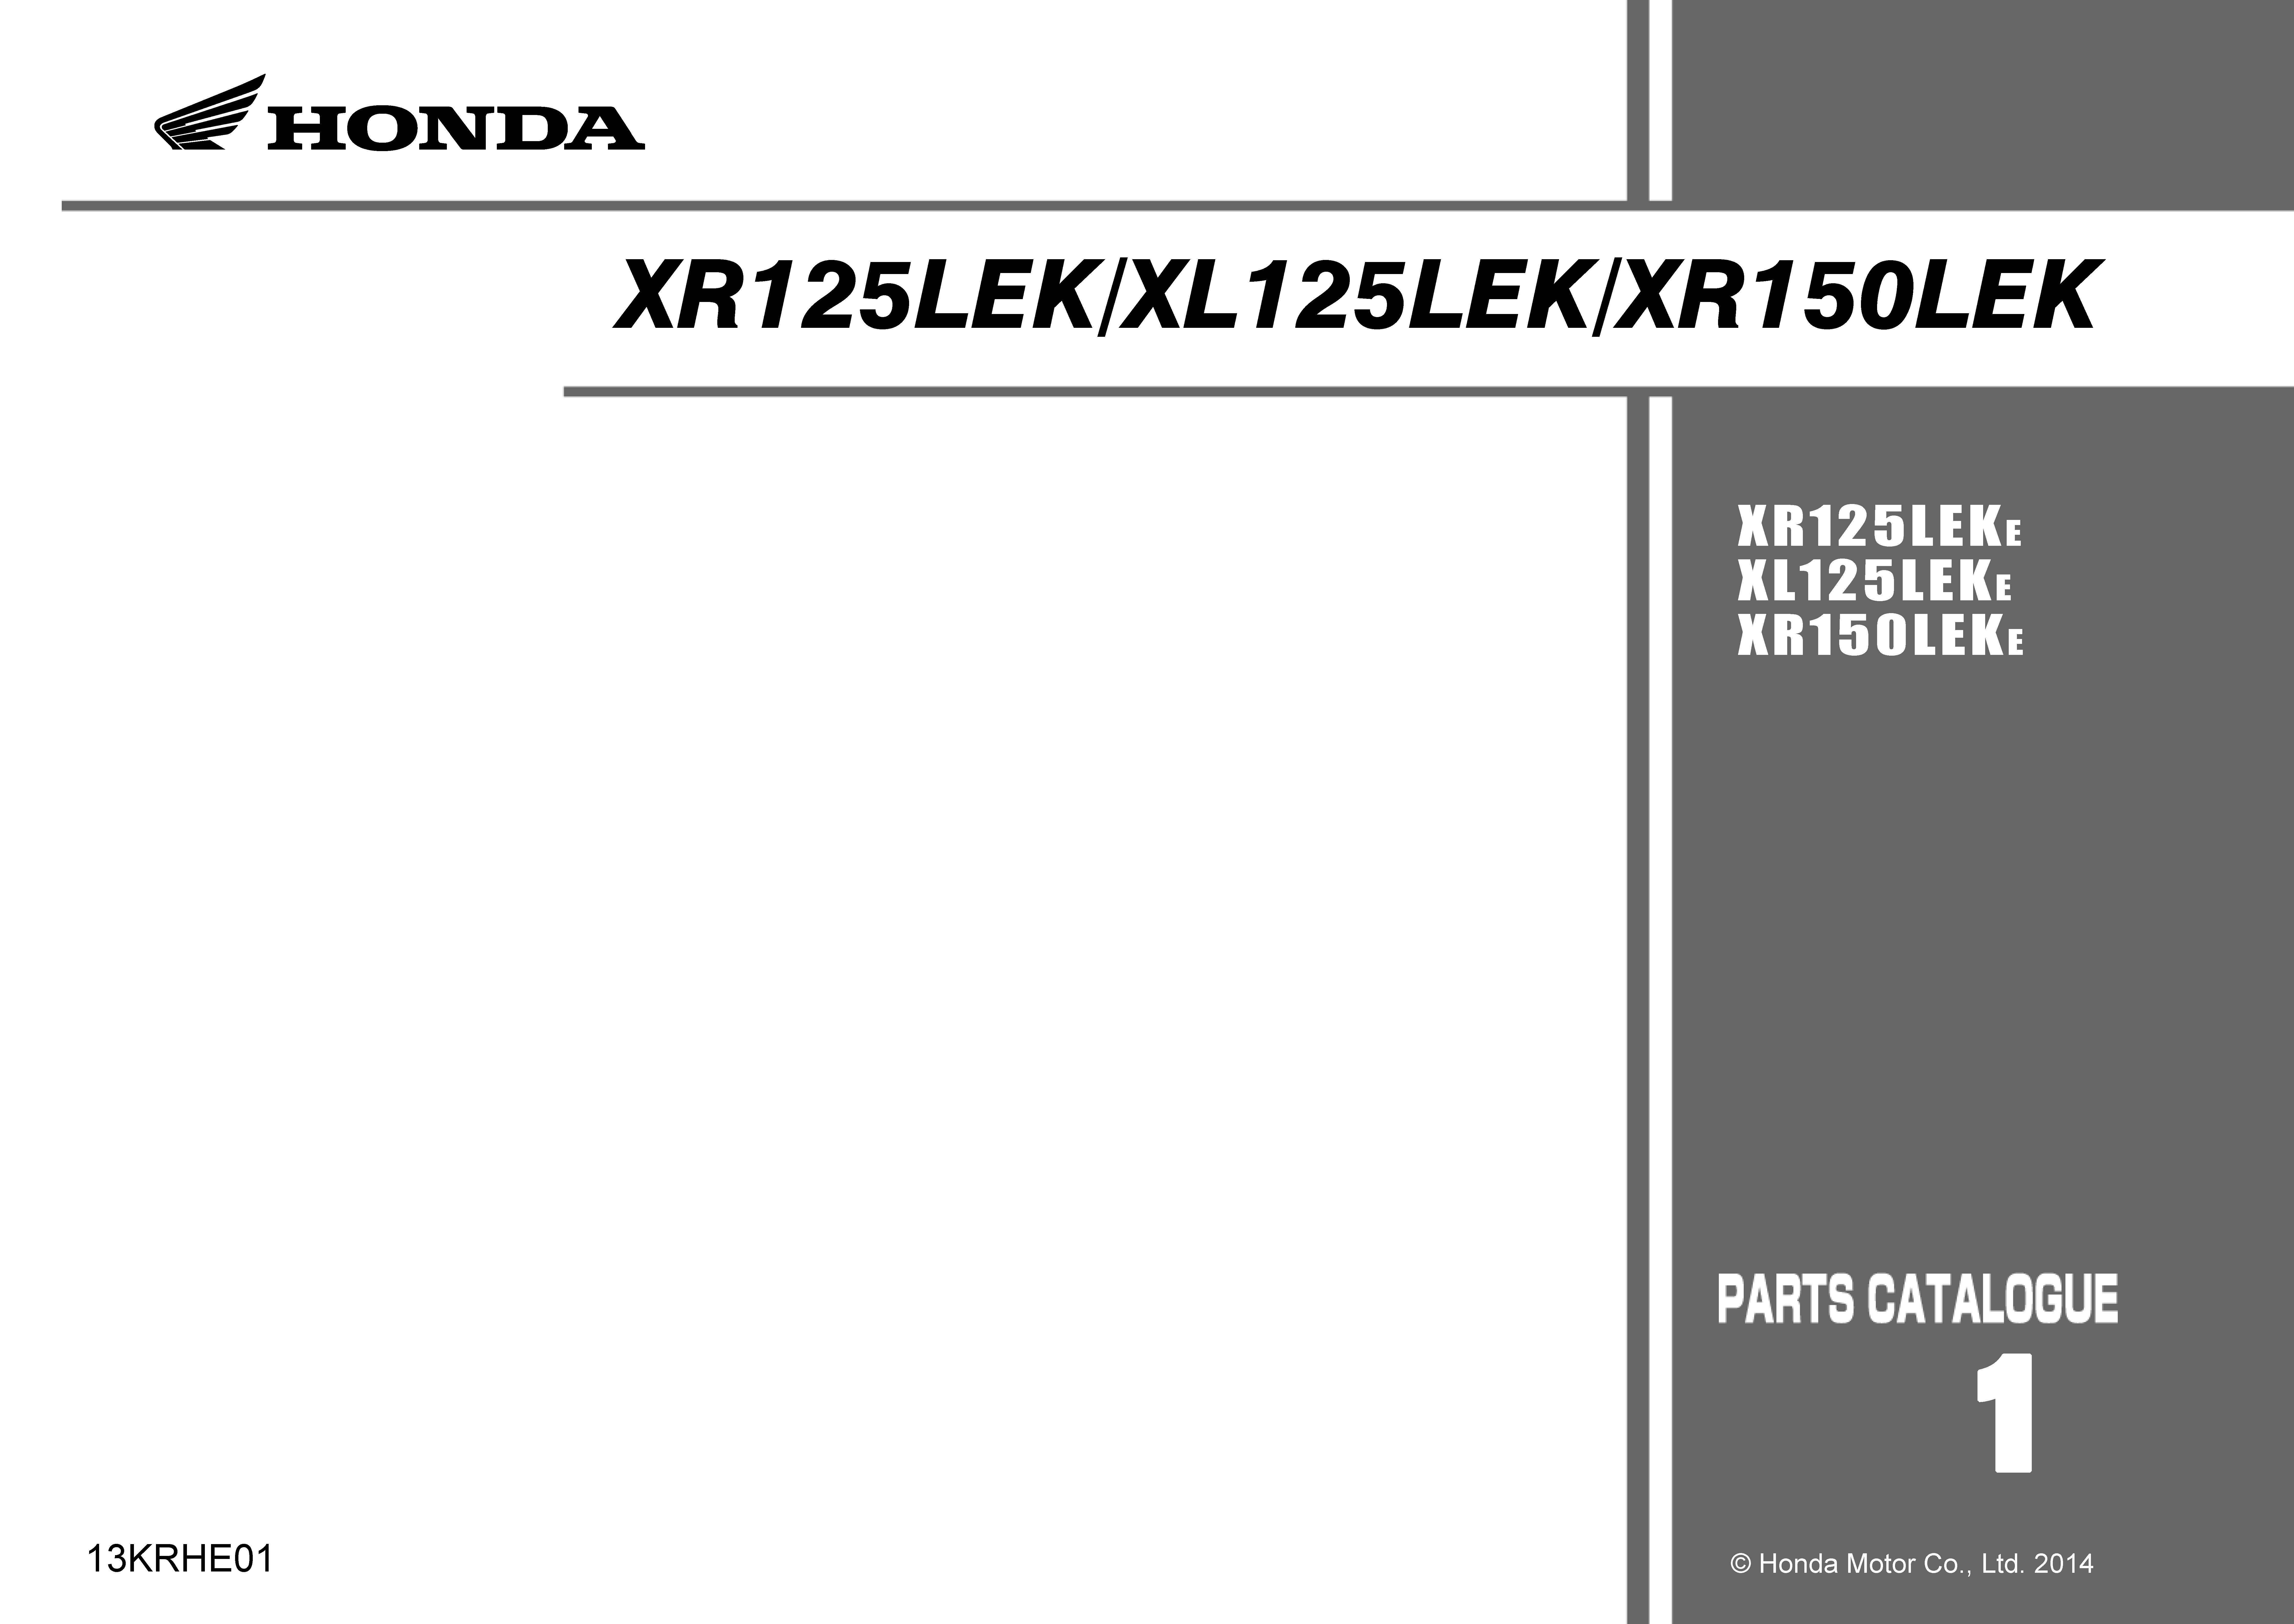 Parts list for Honda XR150LEK (2014)